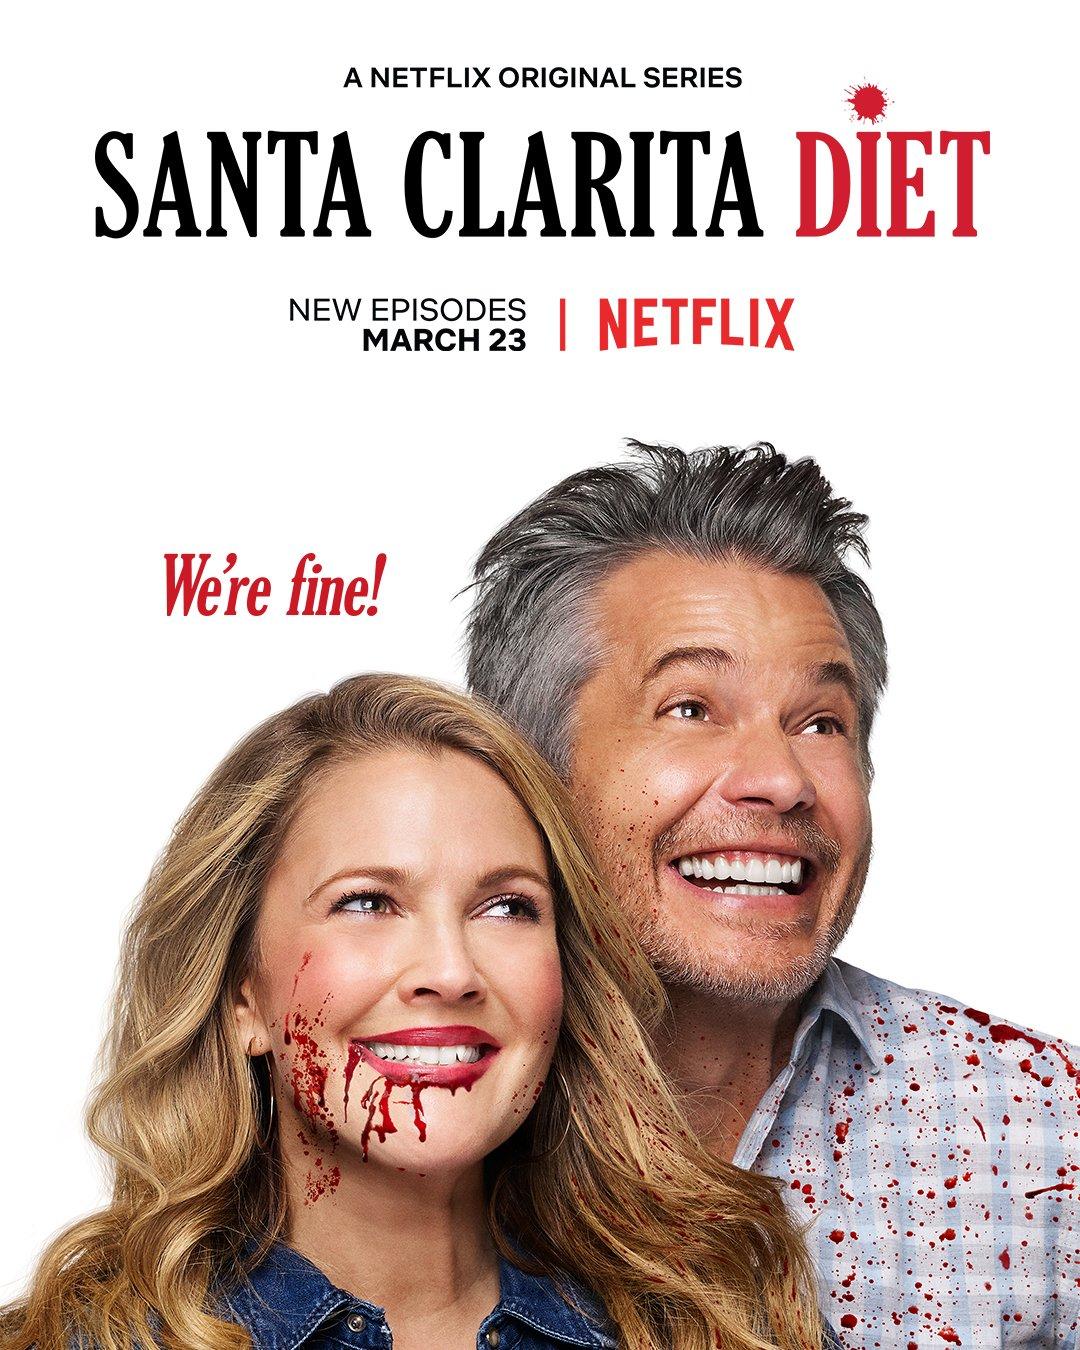 SERIES A GO GO  - Página 37 Santa-clarita-diet-la-2-temporada-llegara-el-28-de-marzo-a-netflix-original